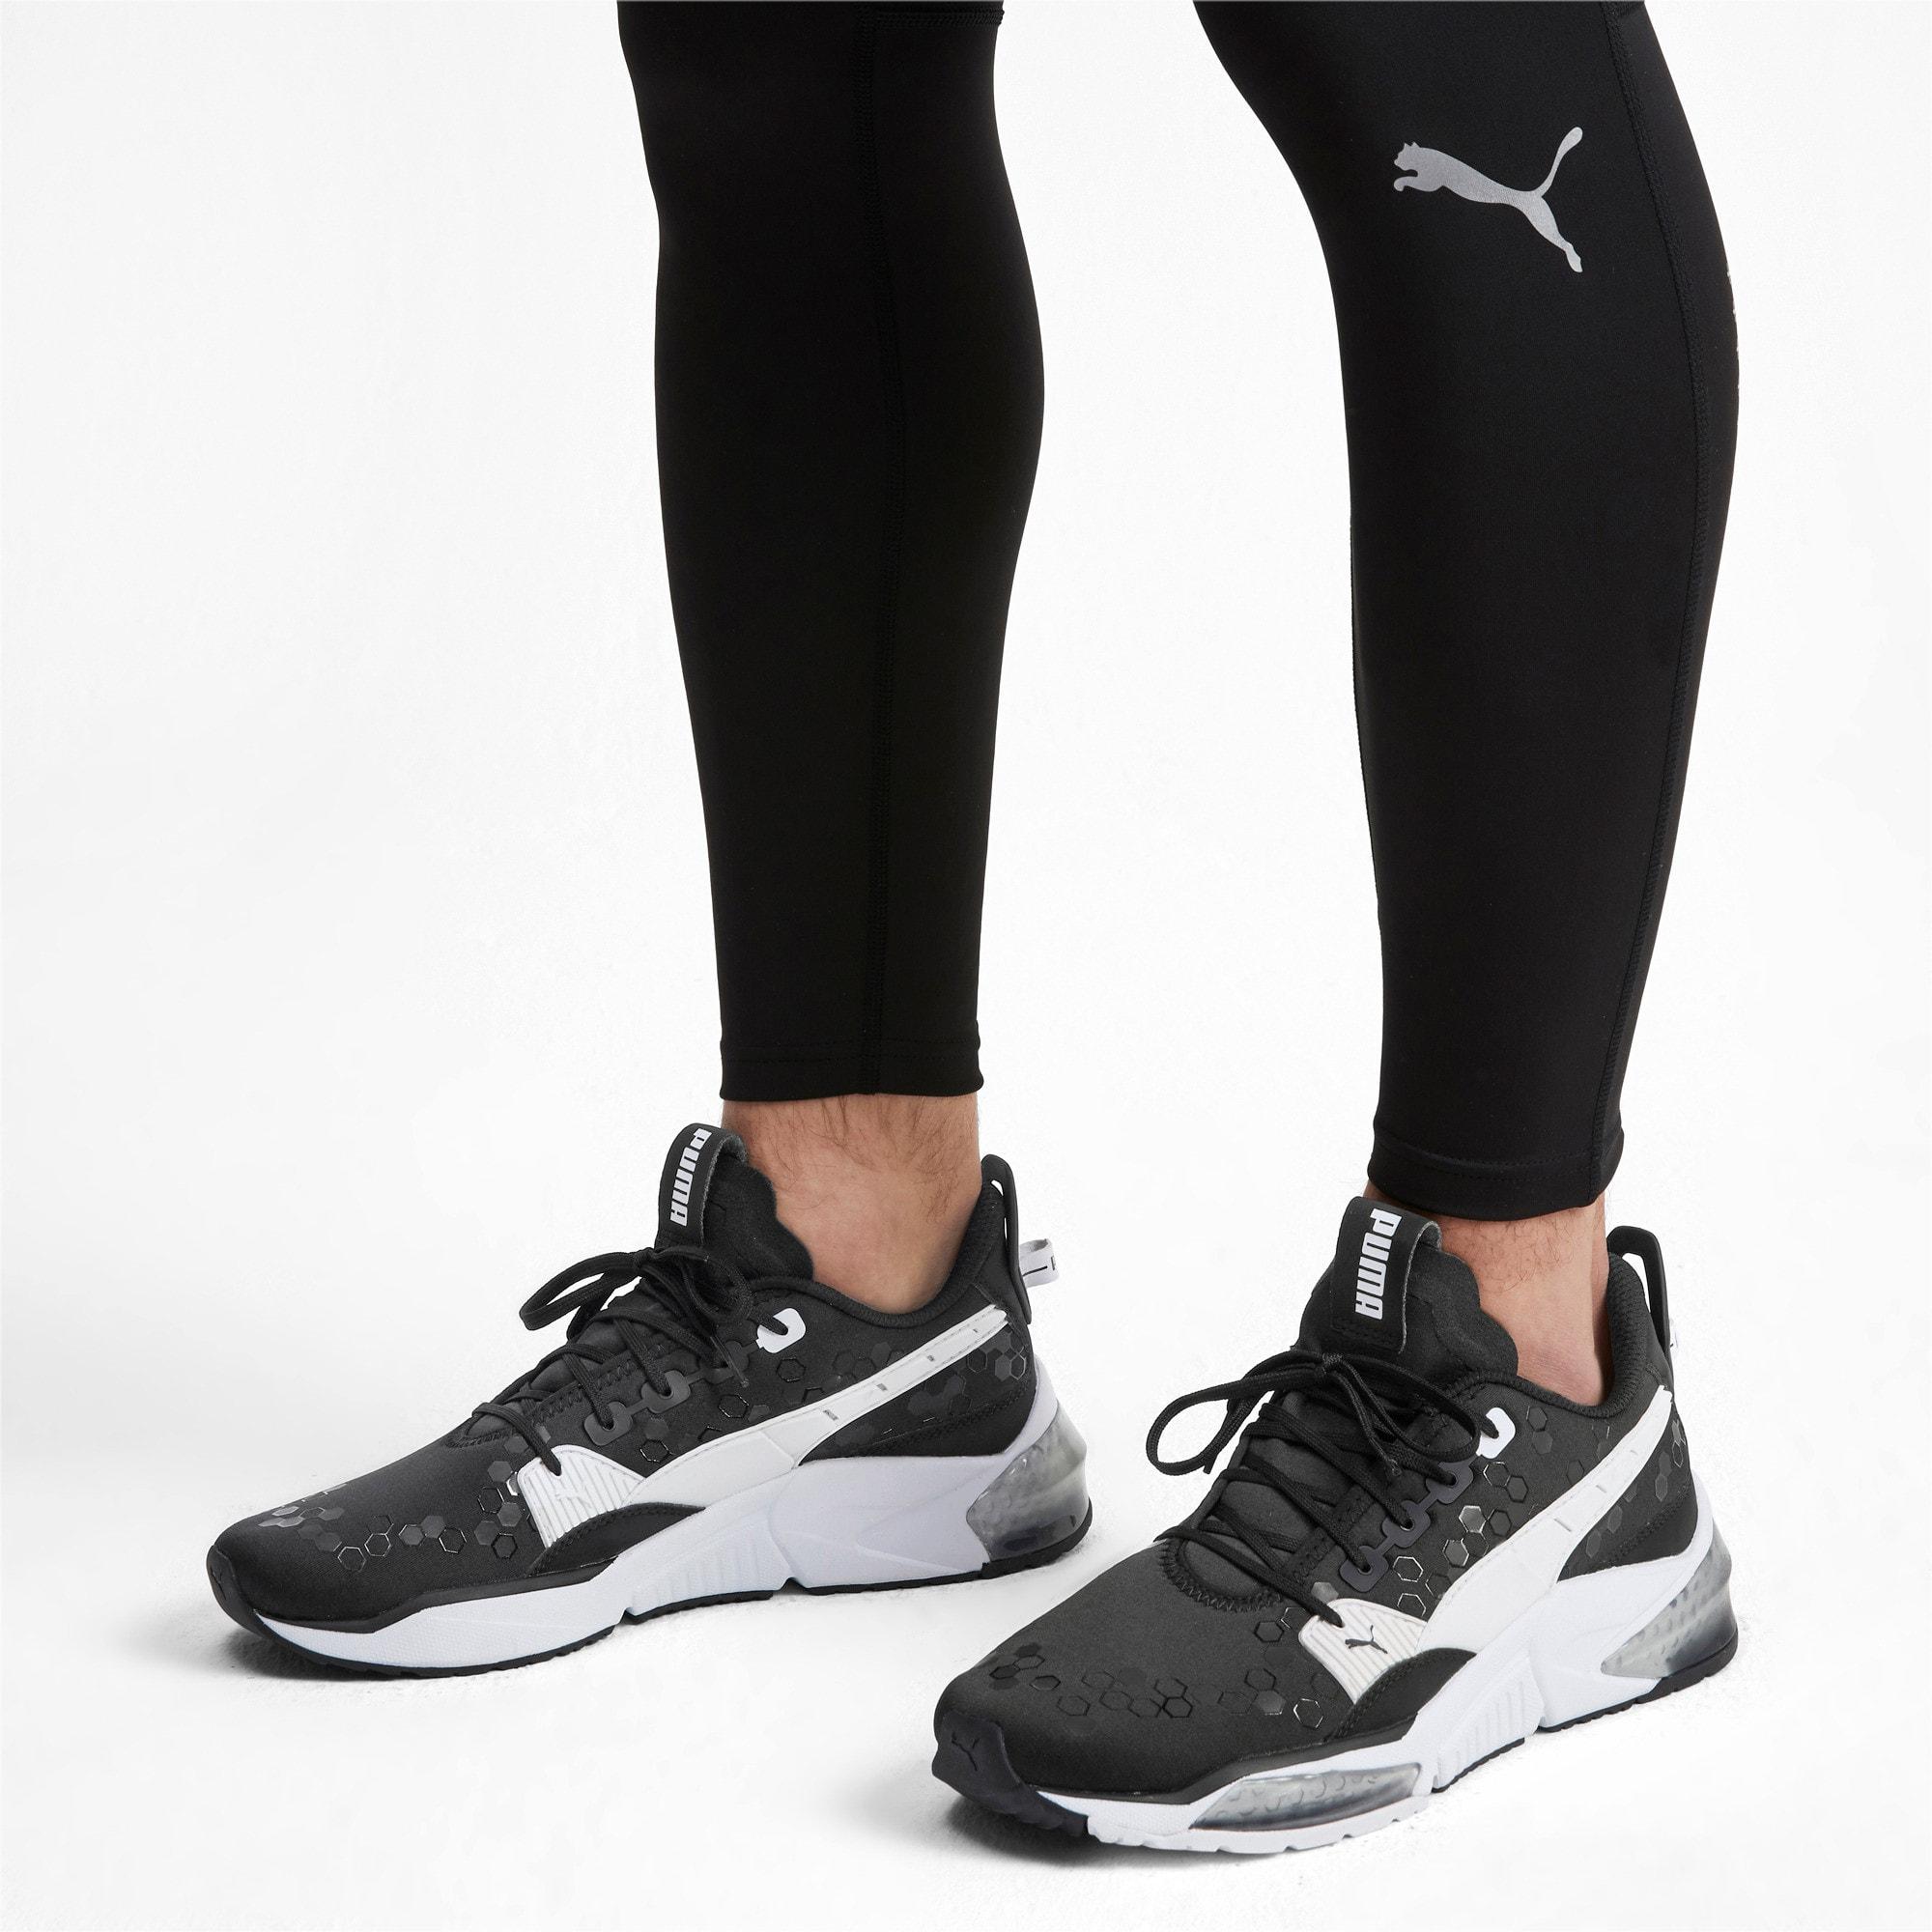 Thumbnail 2 of LQDCELL Optic Training Shoes, Puma Black-Puma White, medium